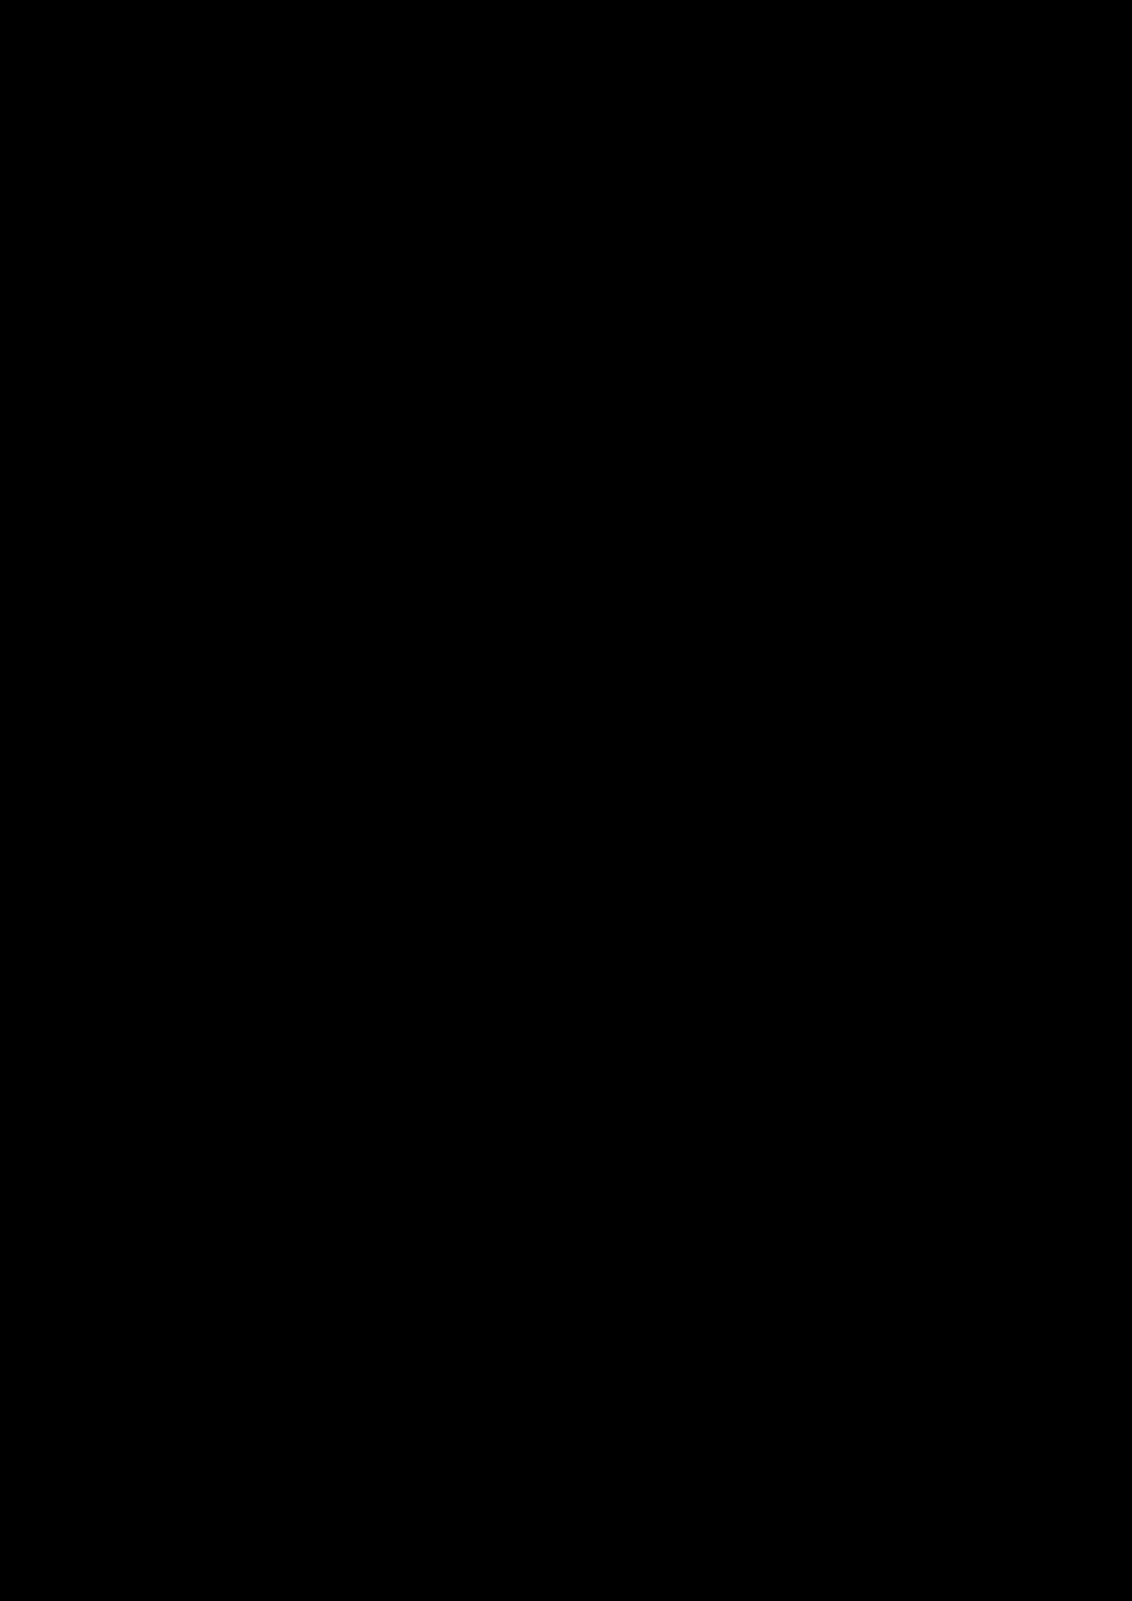 Menshe nas slide, Image 3